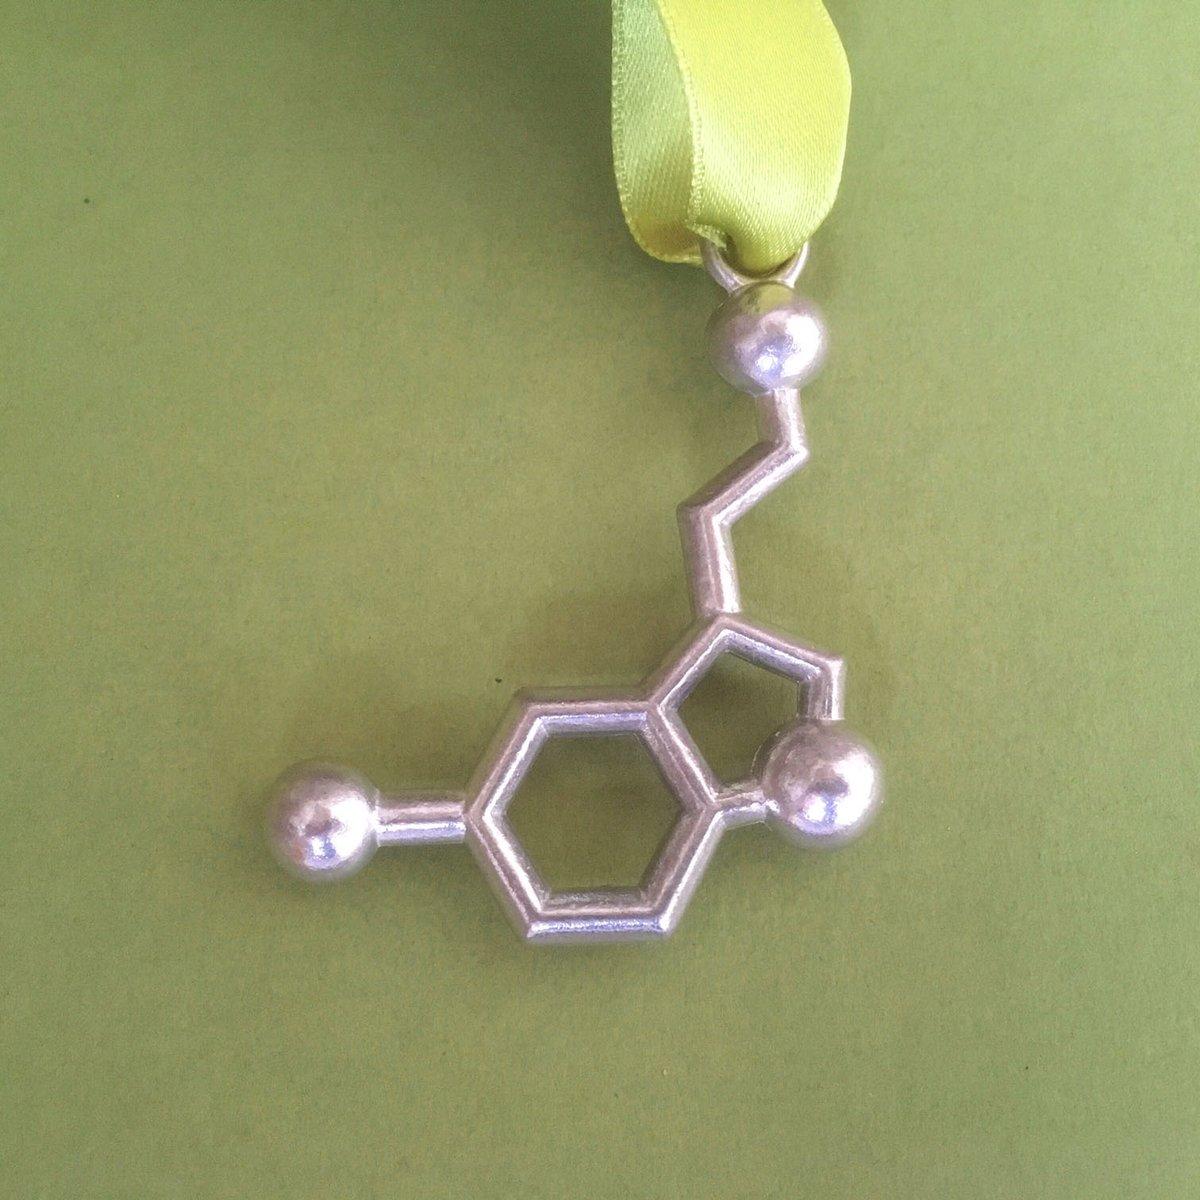 Image of serotonin ornament